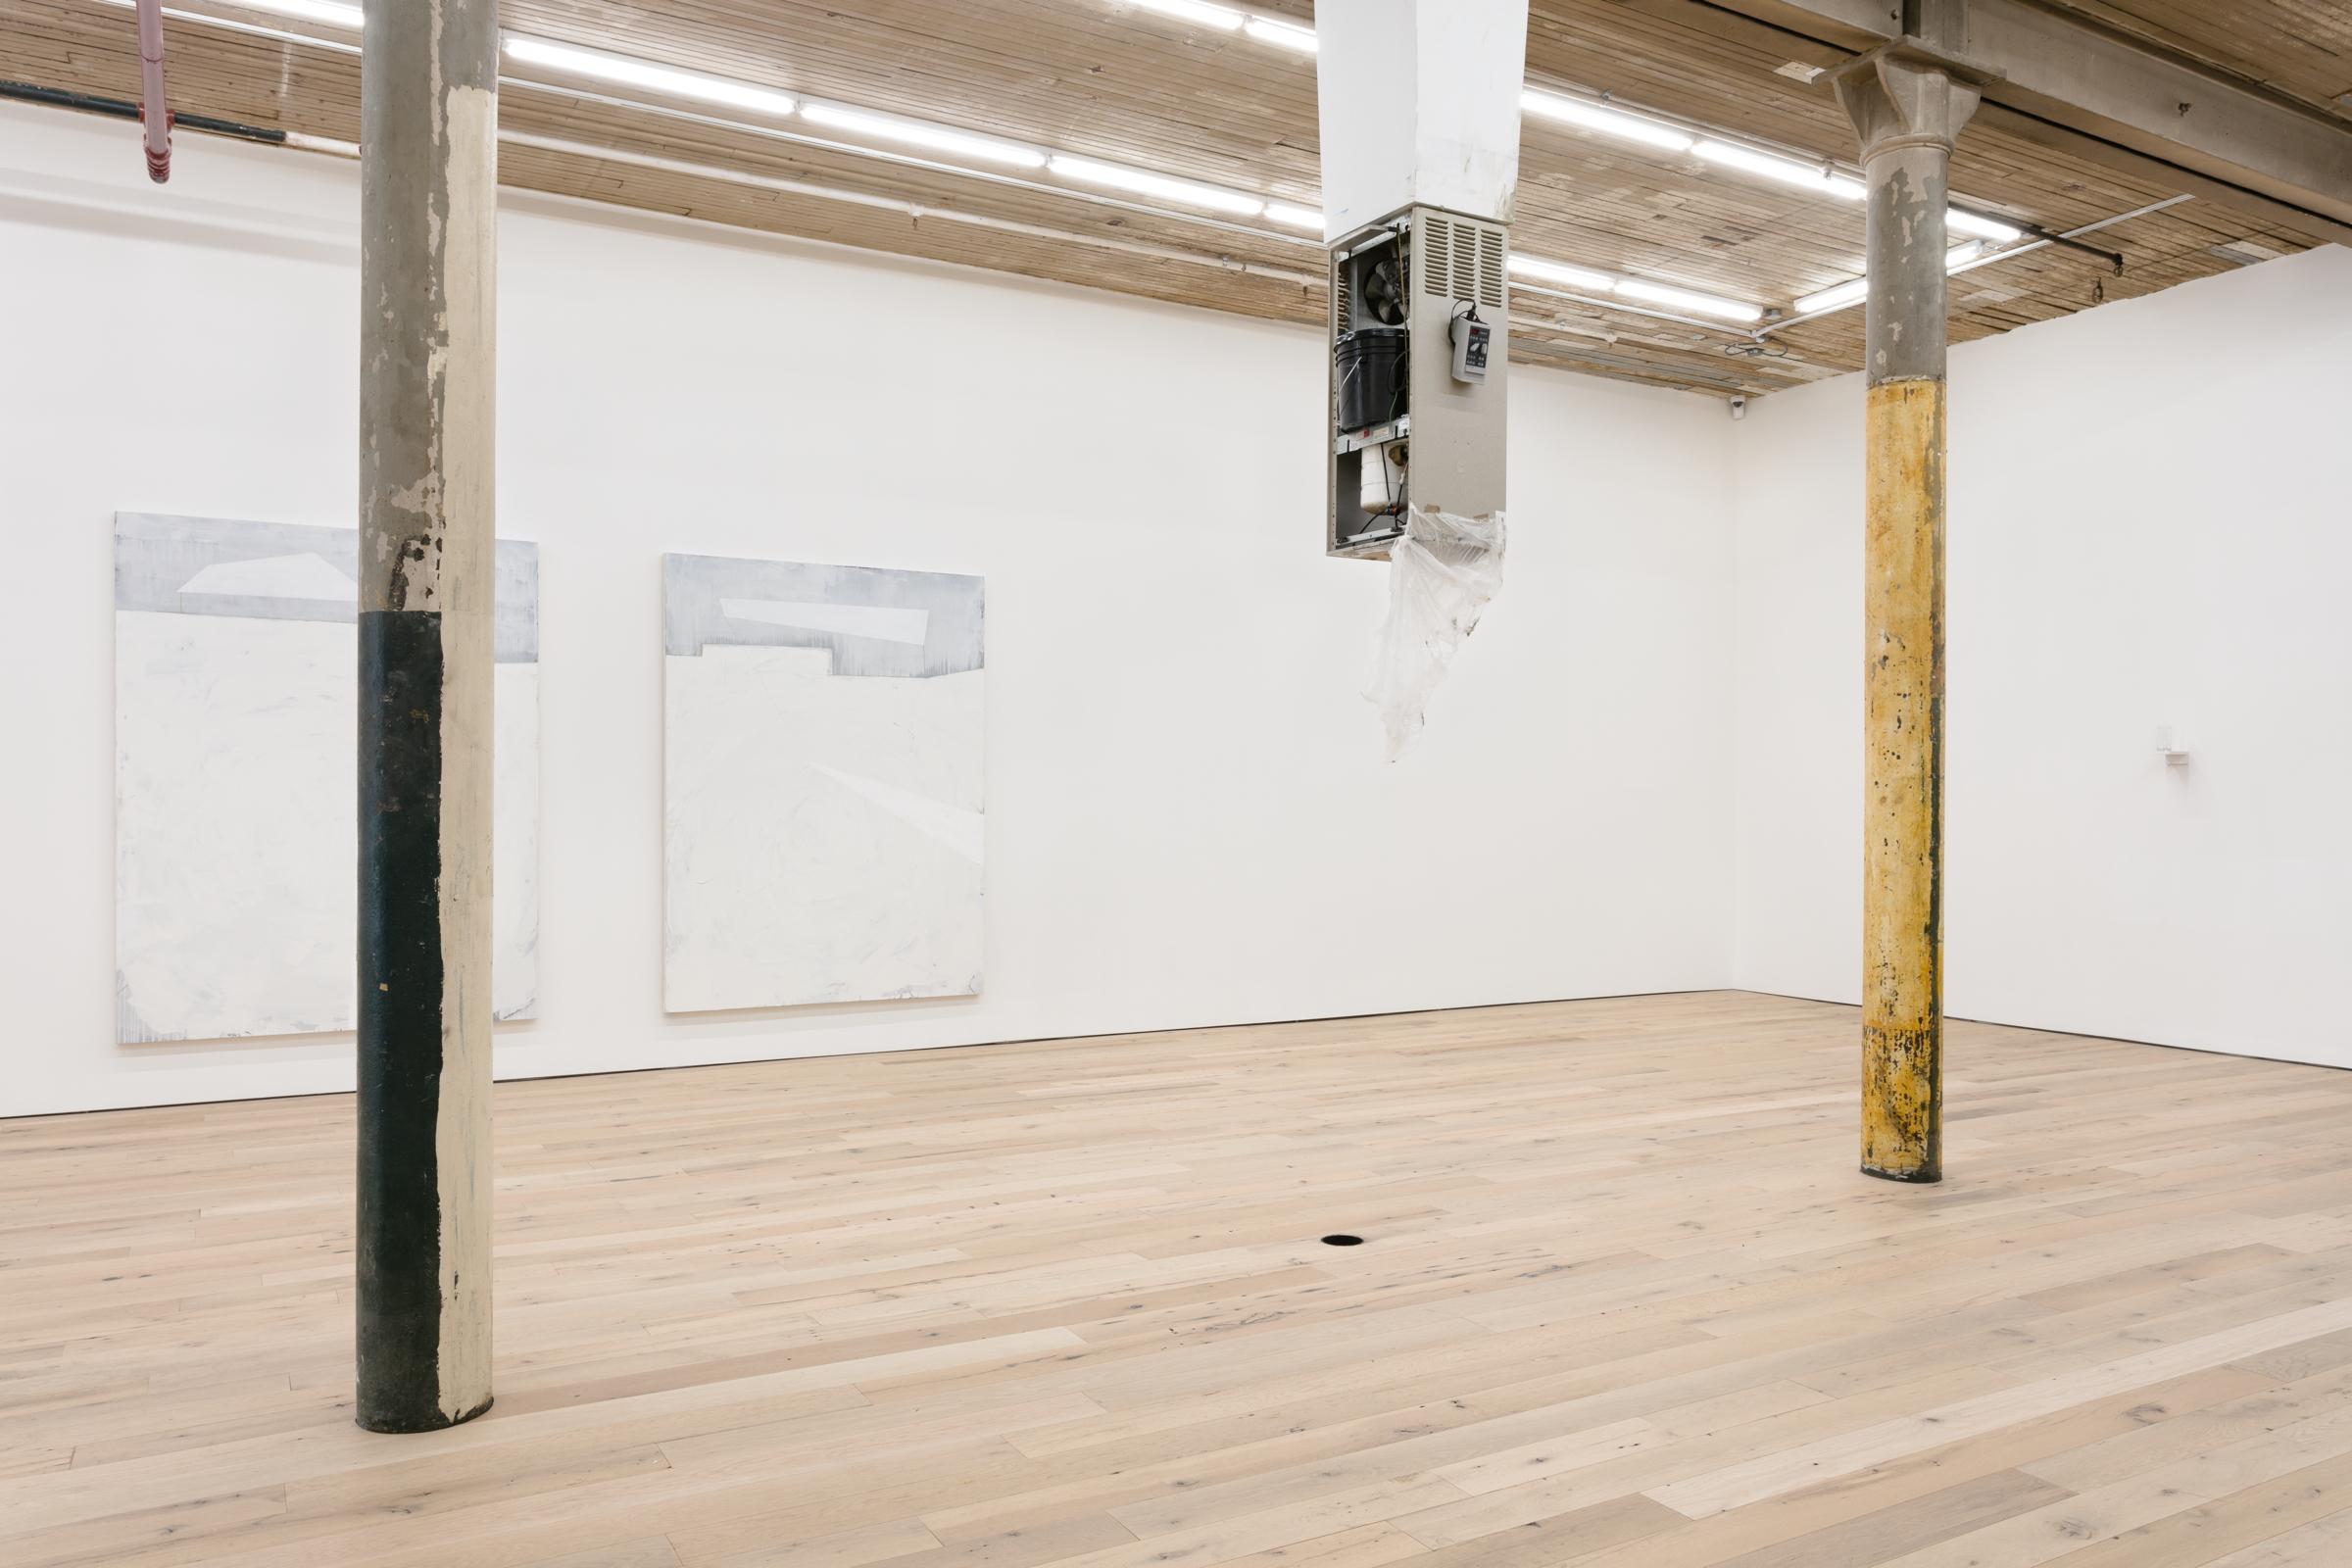 Installation view, Invisible Man, Martos Gallery, New York, 2017